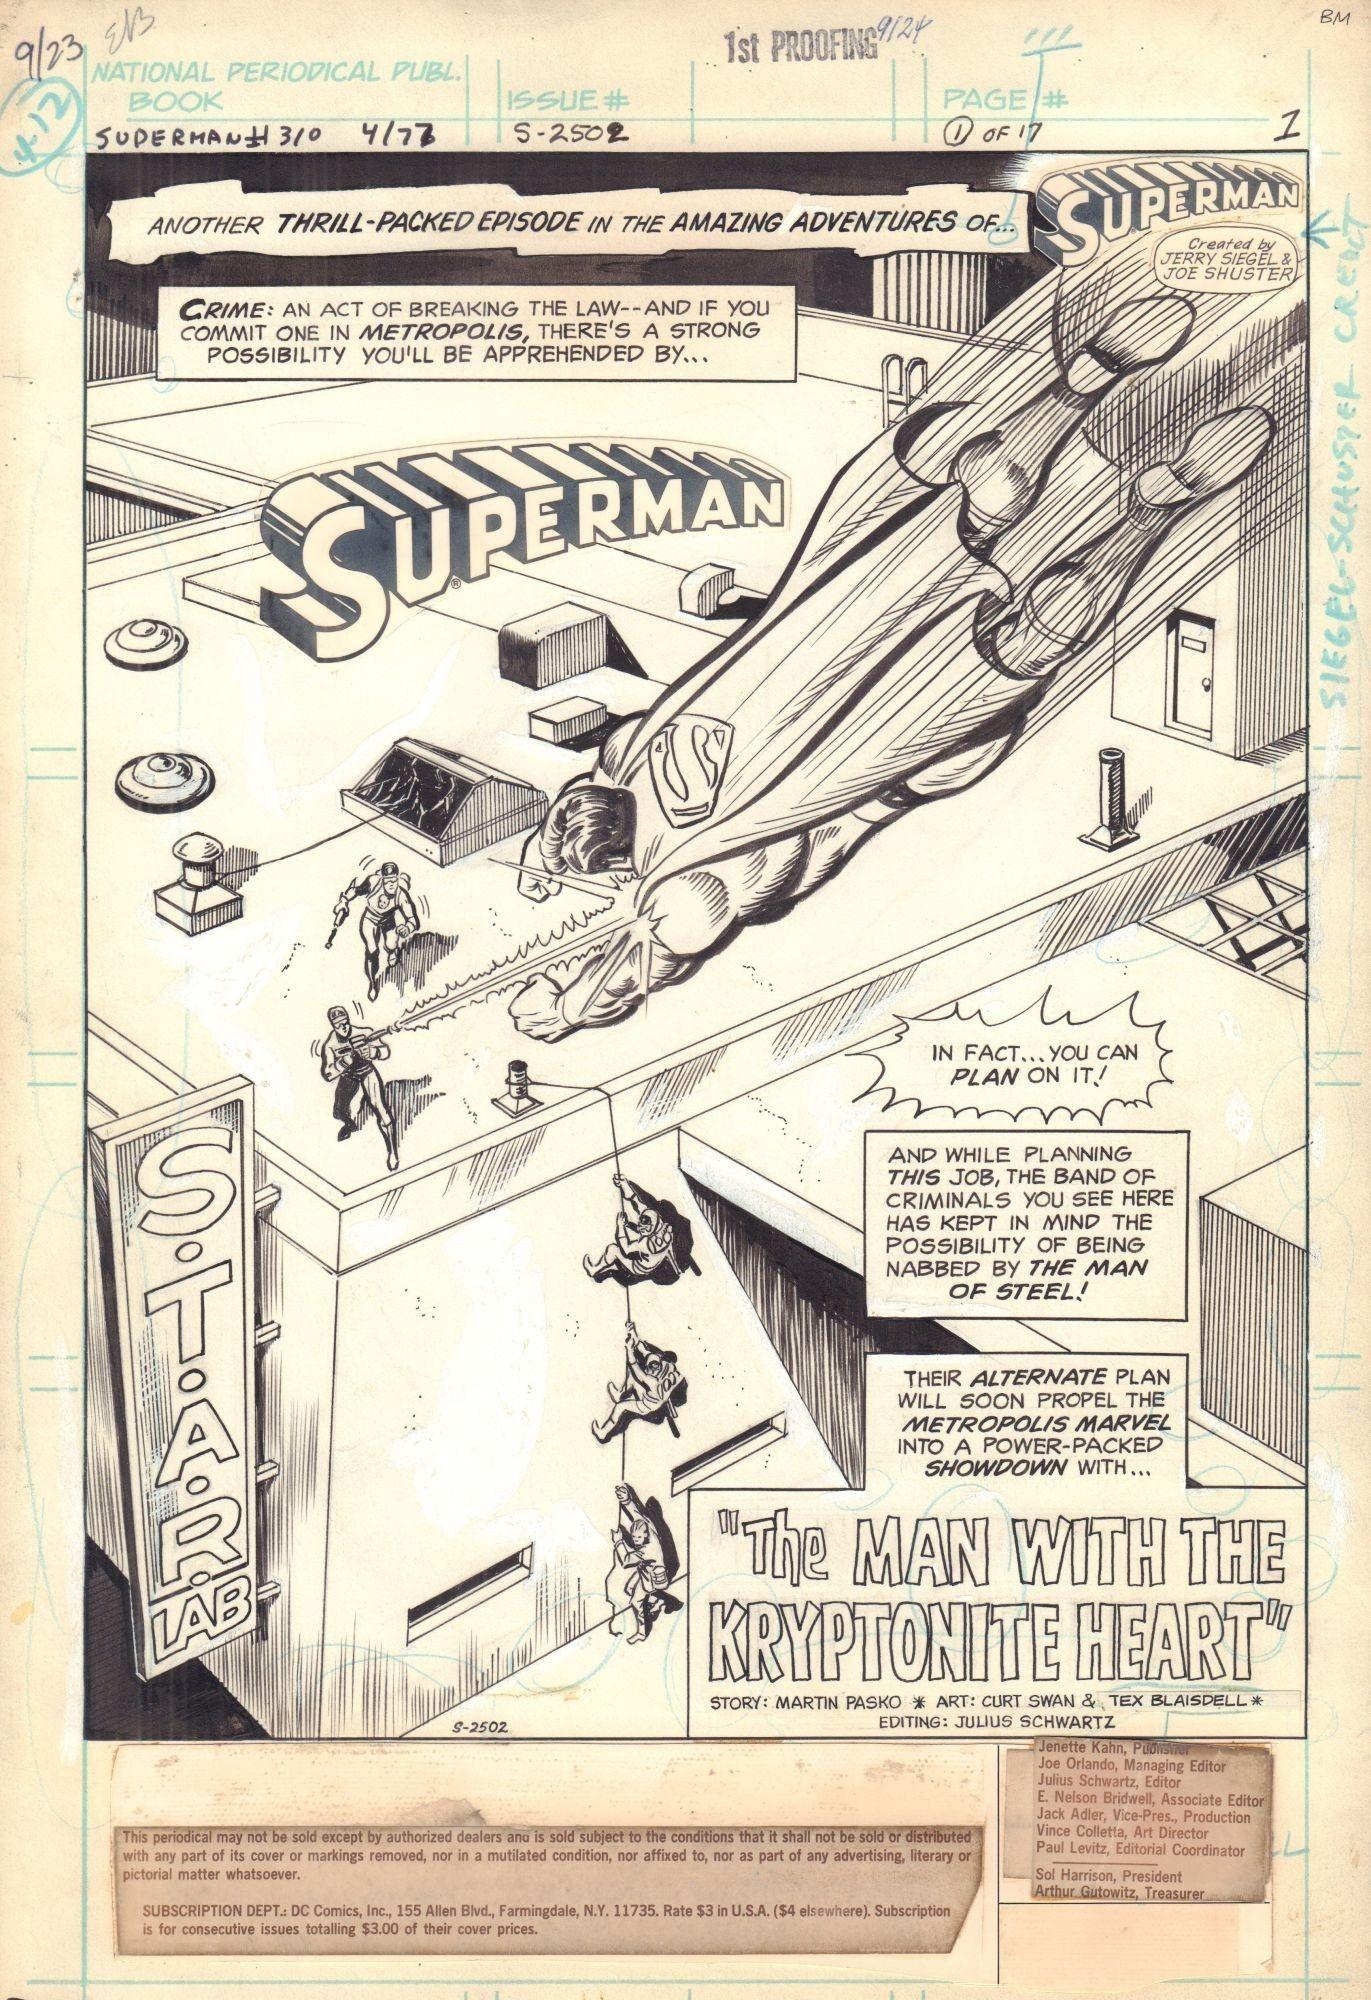 Superman #310 / 1